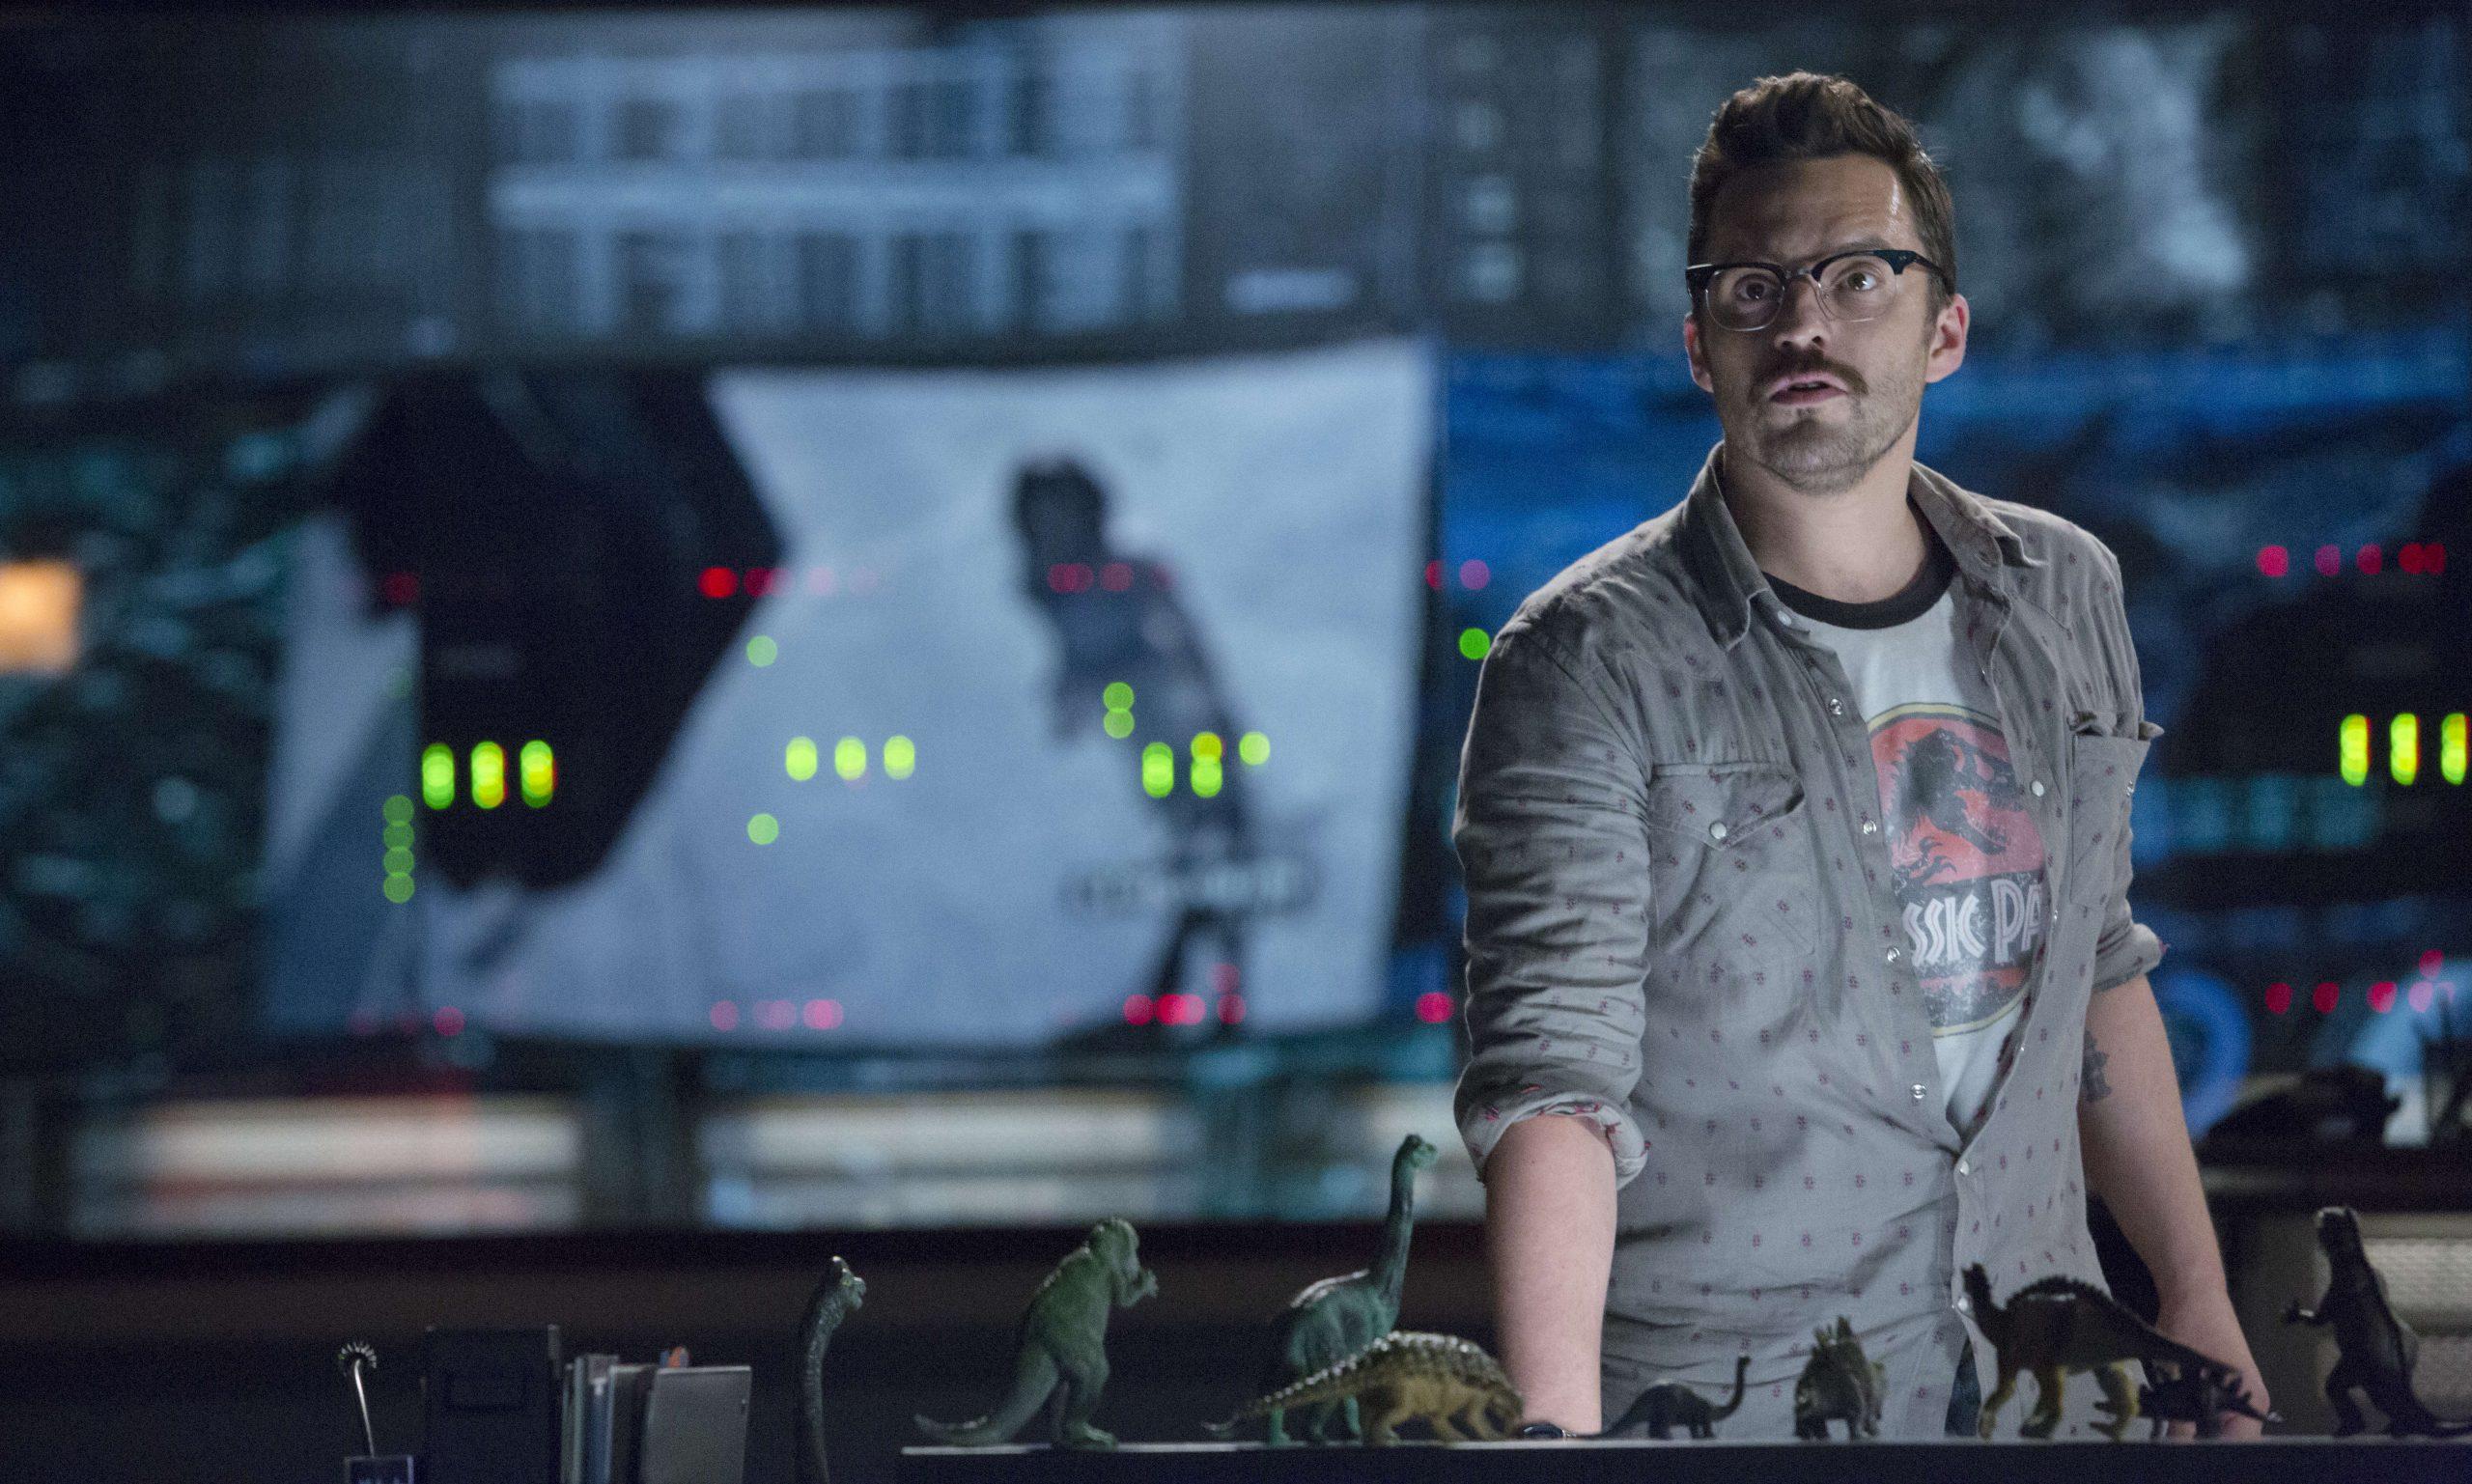 Jake Johnson will not appear in Jurassic World: Dominion